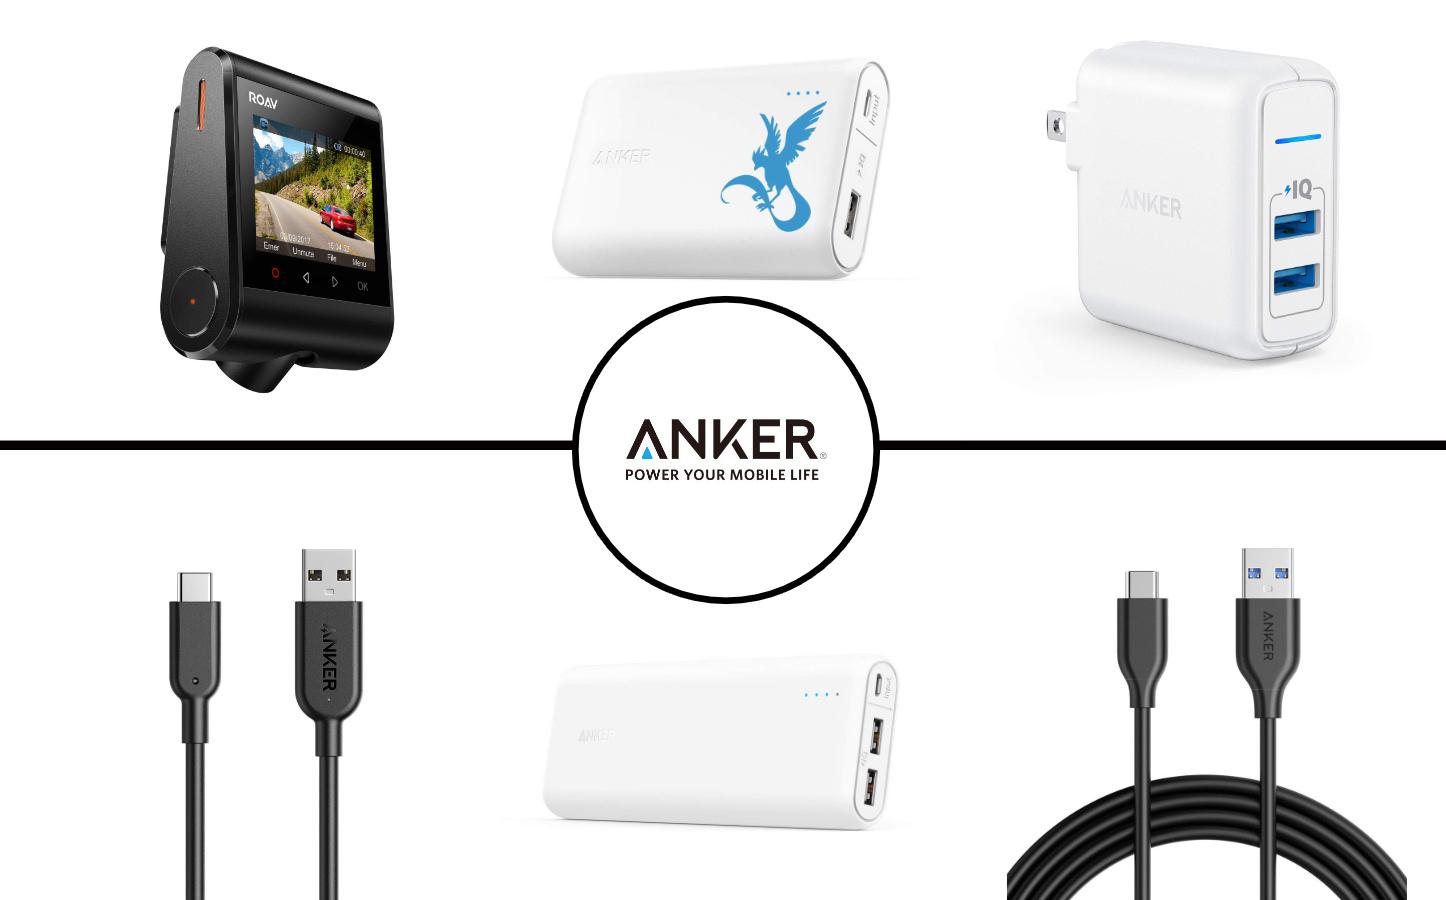 Anker-Time-Sale-Sale-20180902.jpg